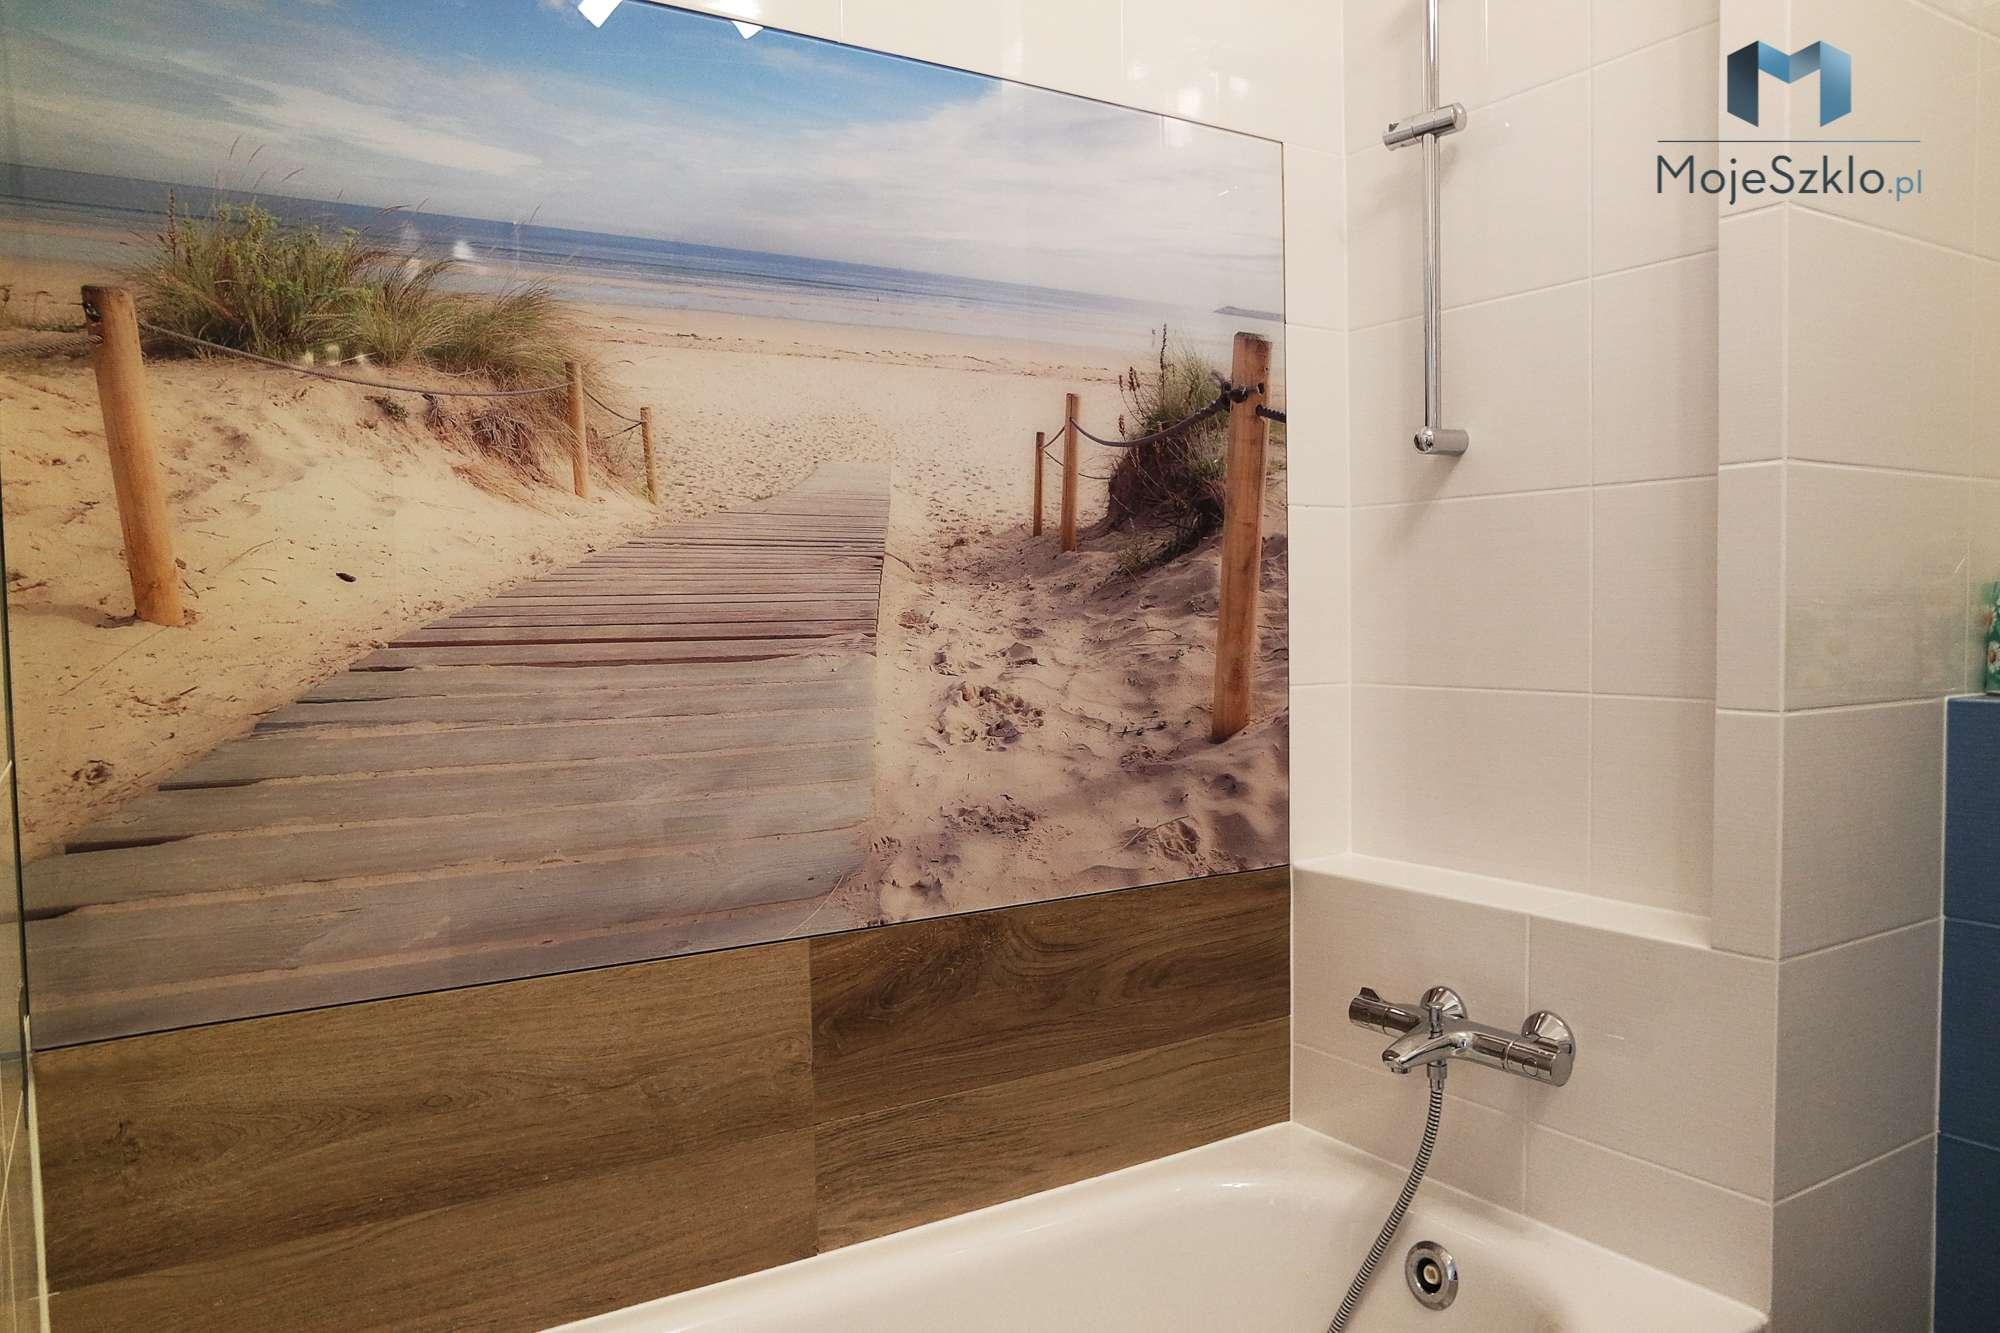 Panel Szklany Plaza Lazienka - Panel szklany plaża, krajobraz morski